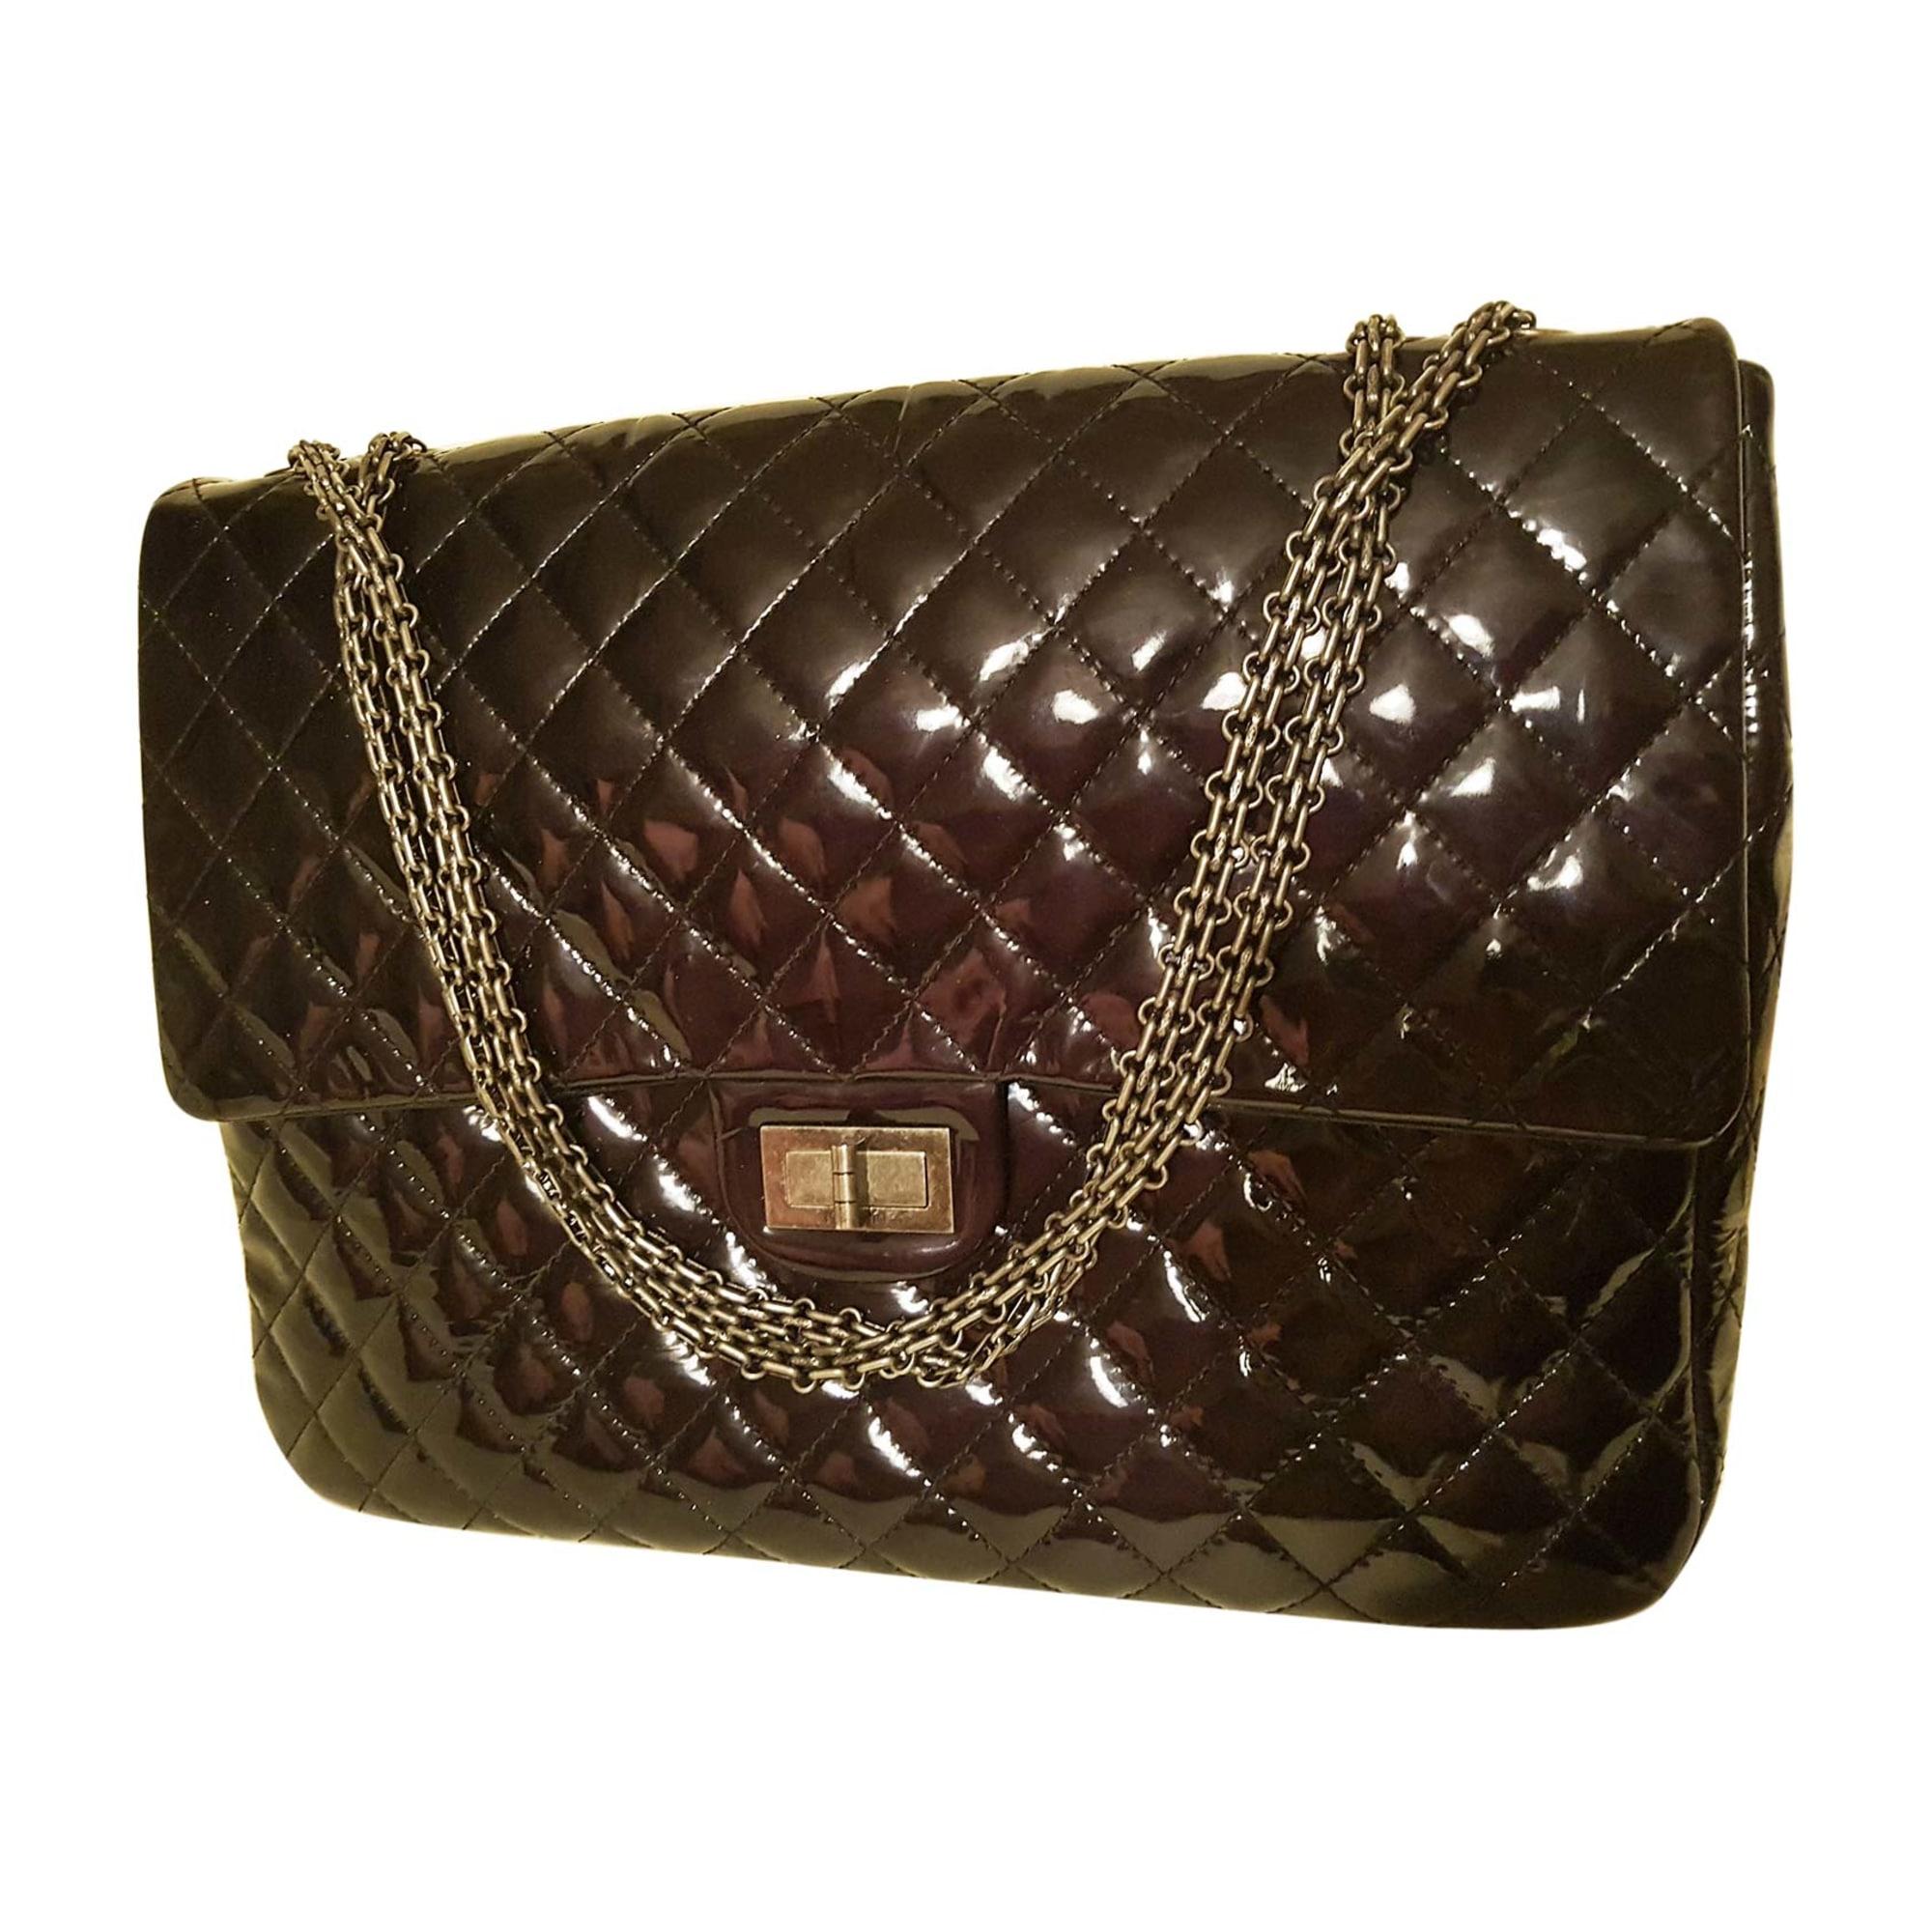 f6edd27e946 Sac XL en cuir CHANEL 255 noir - 7927887